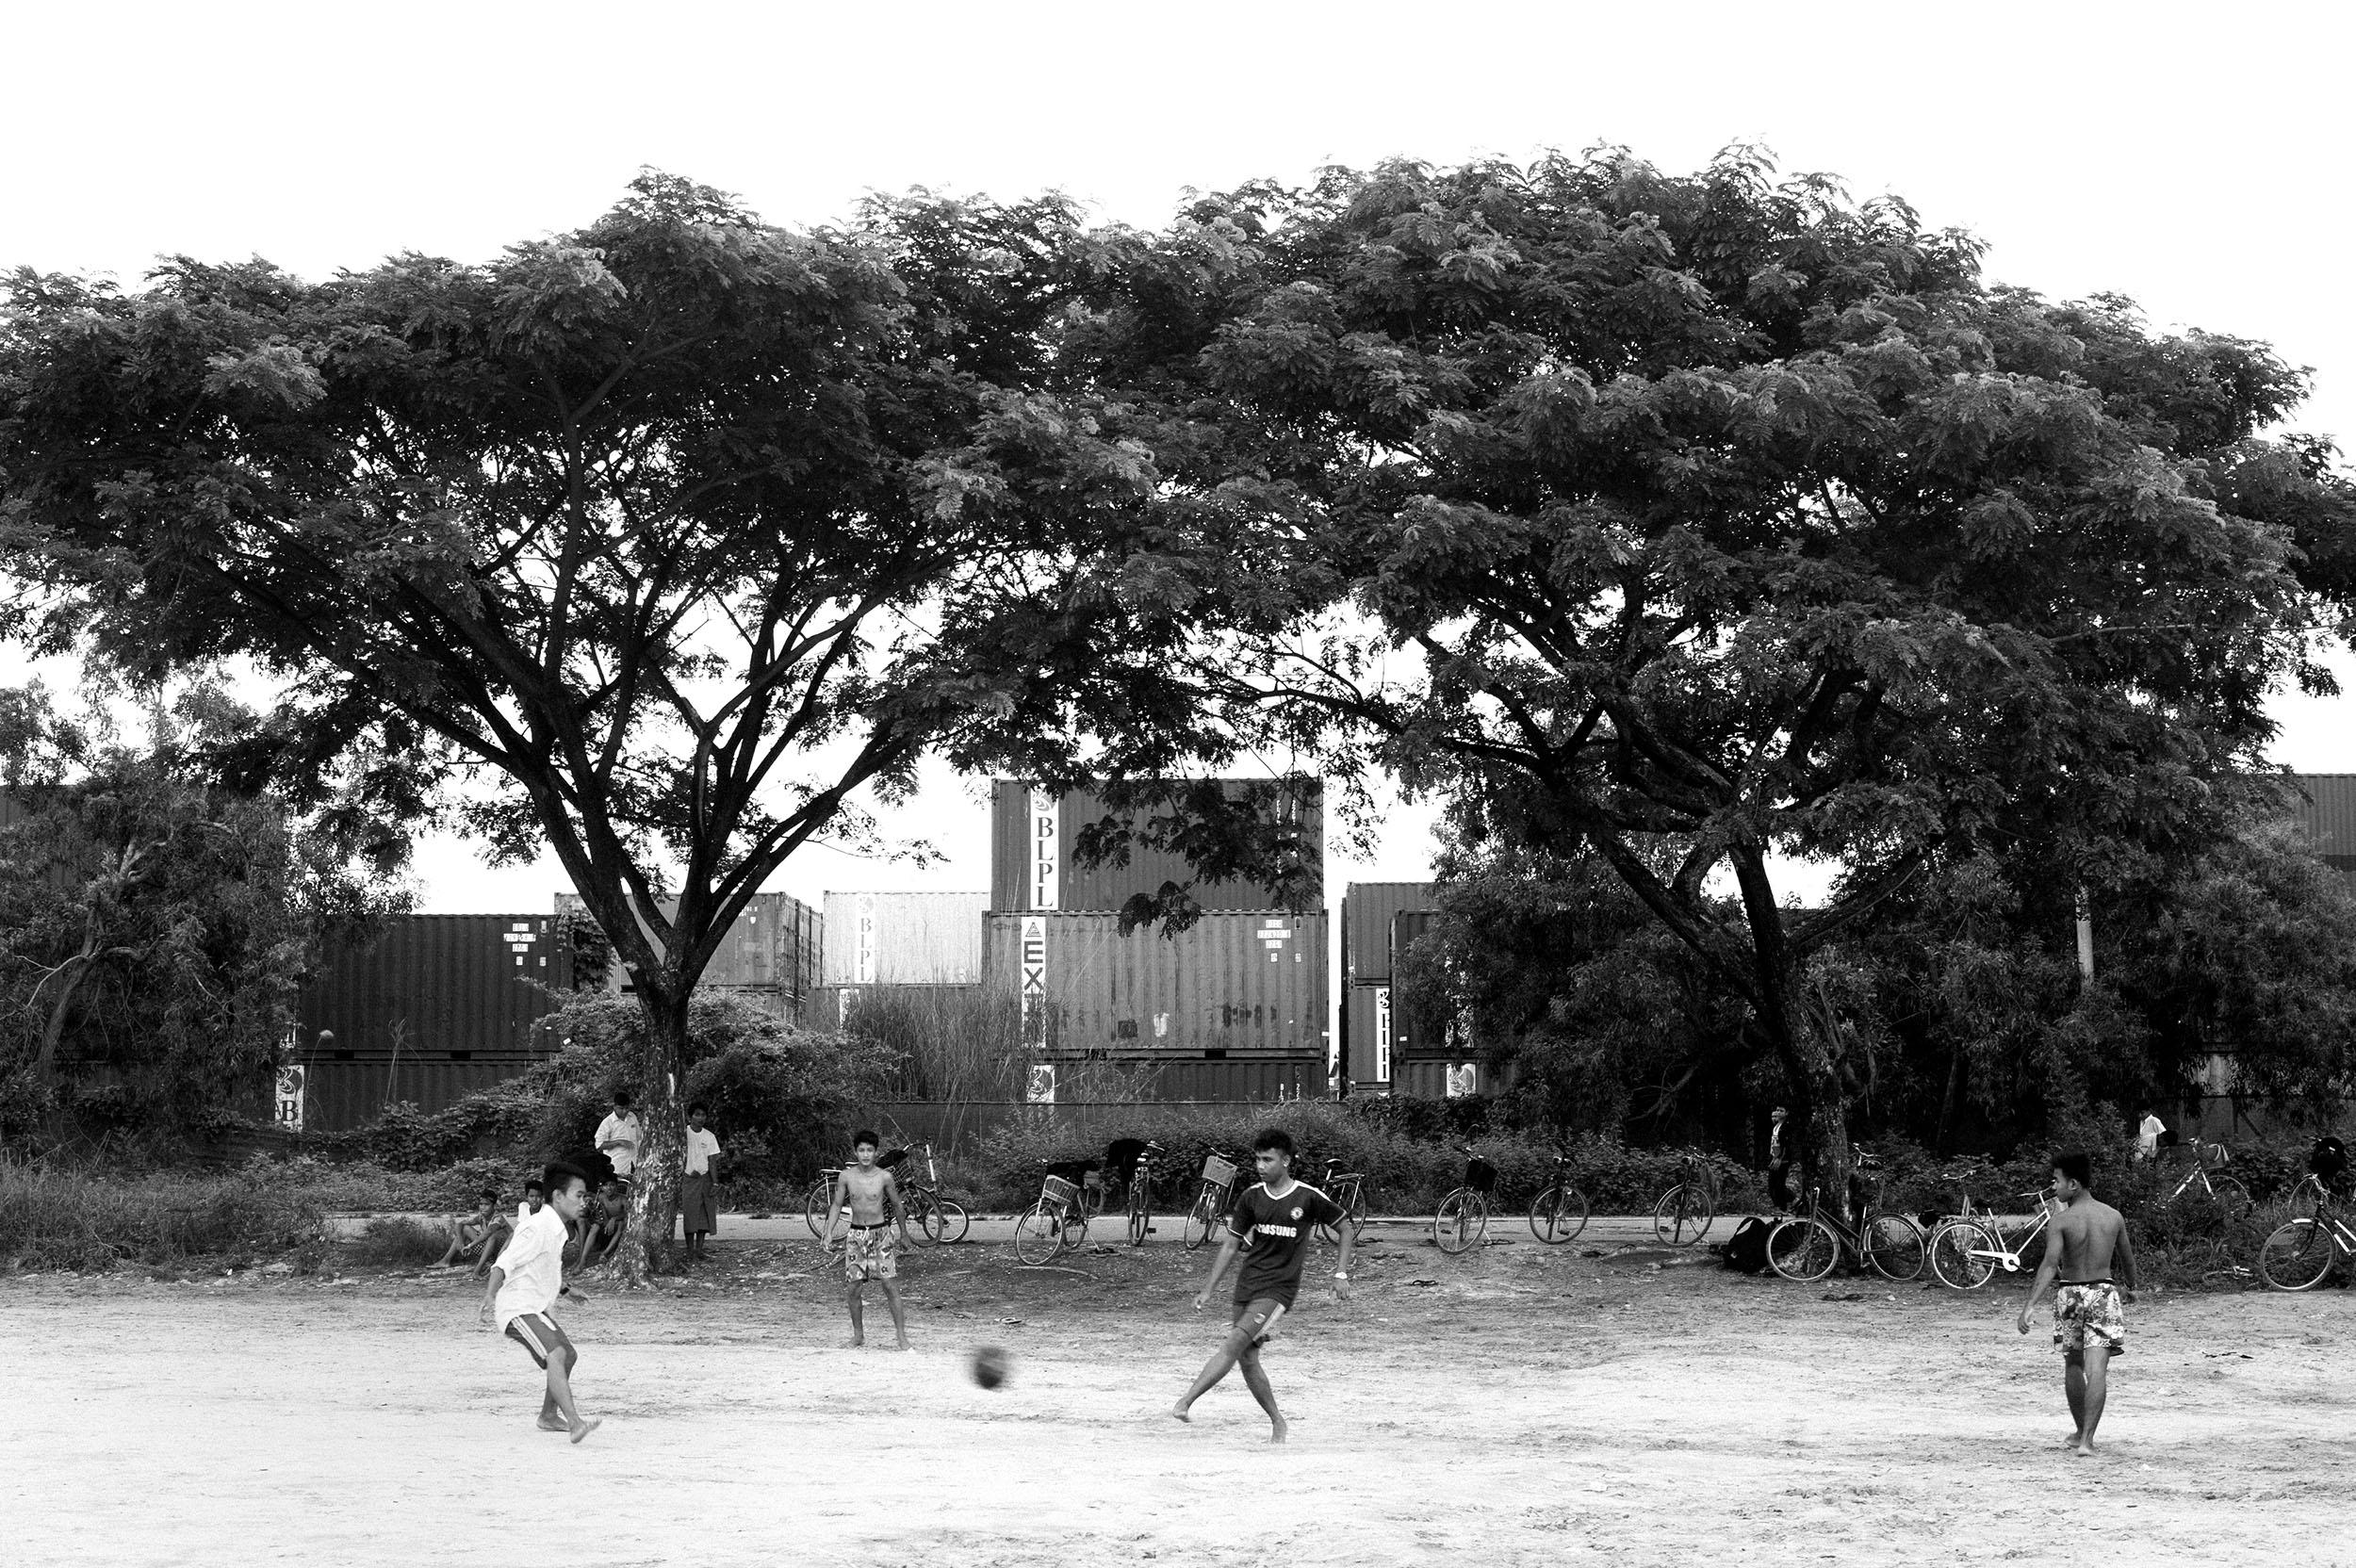 Boys play football in Hlaing Thayar.